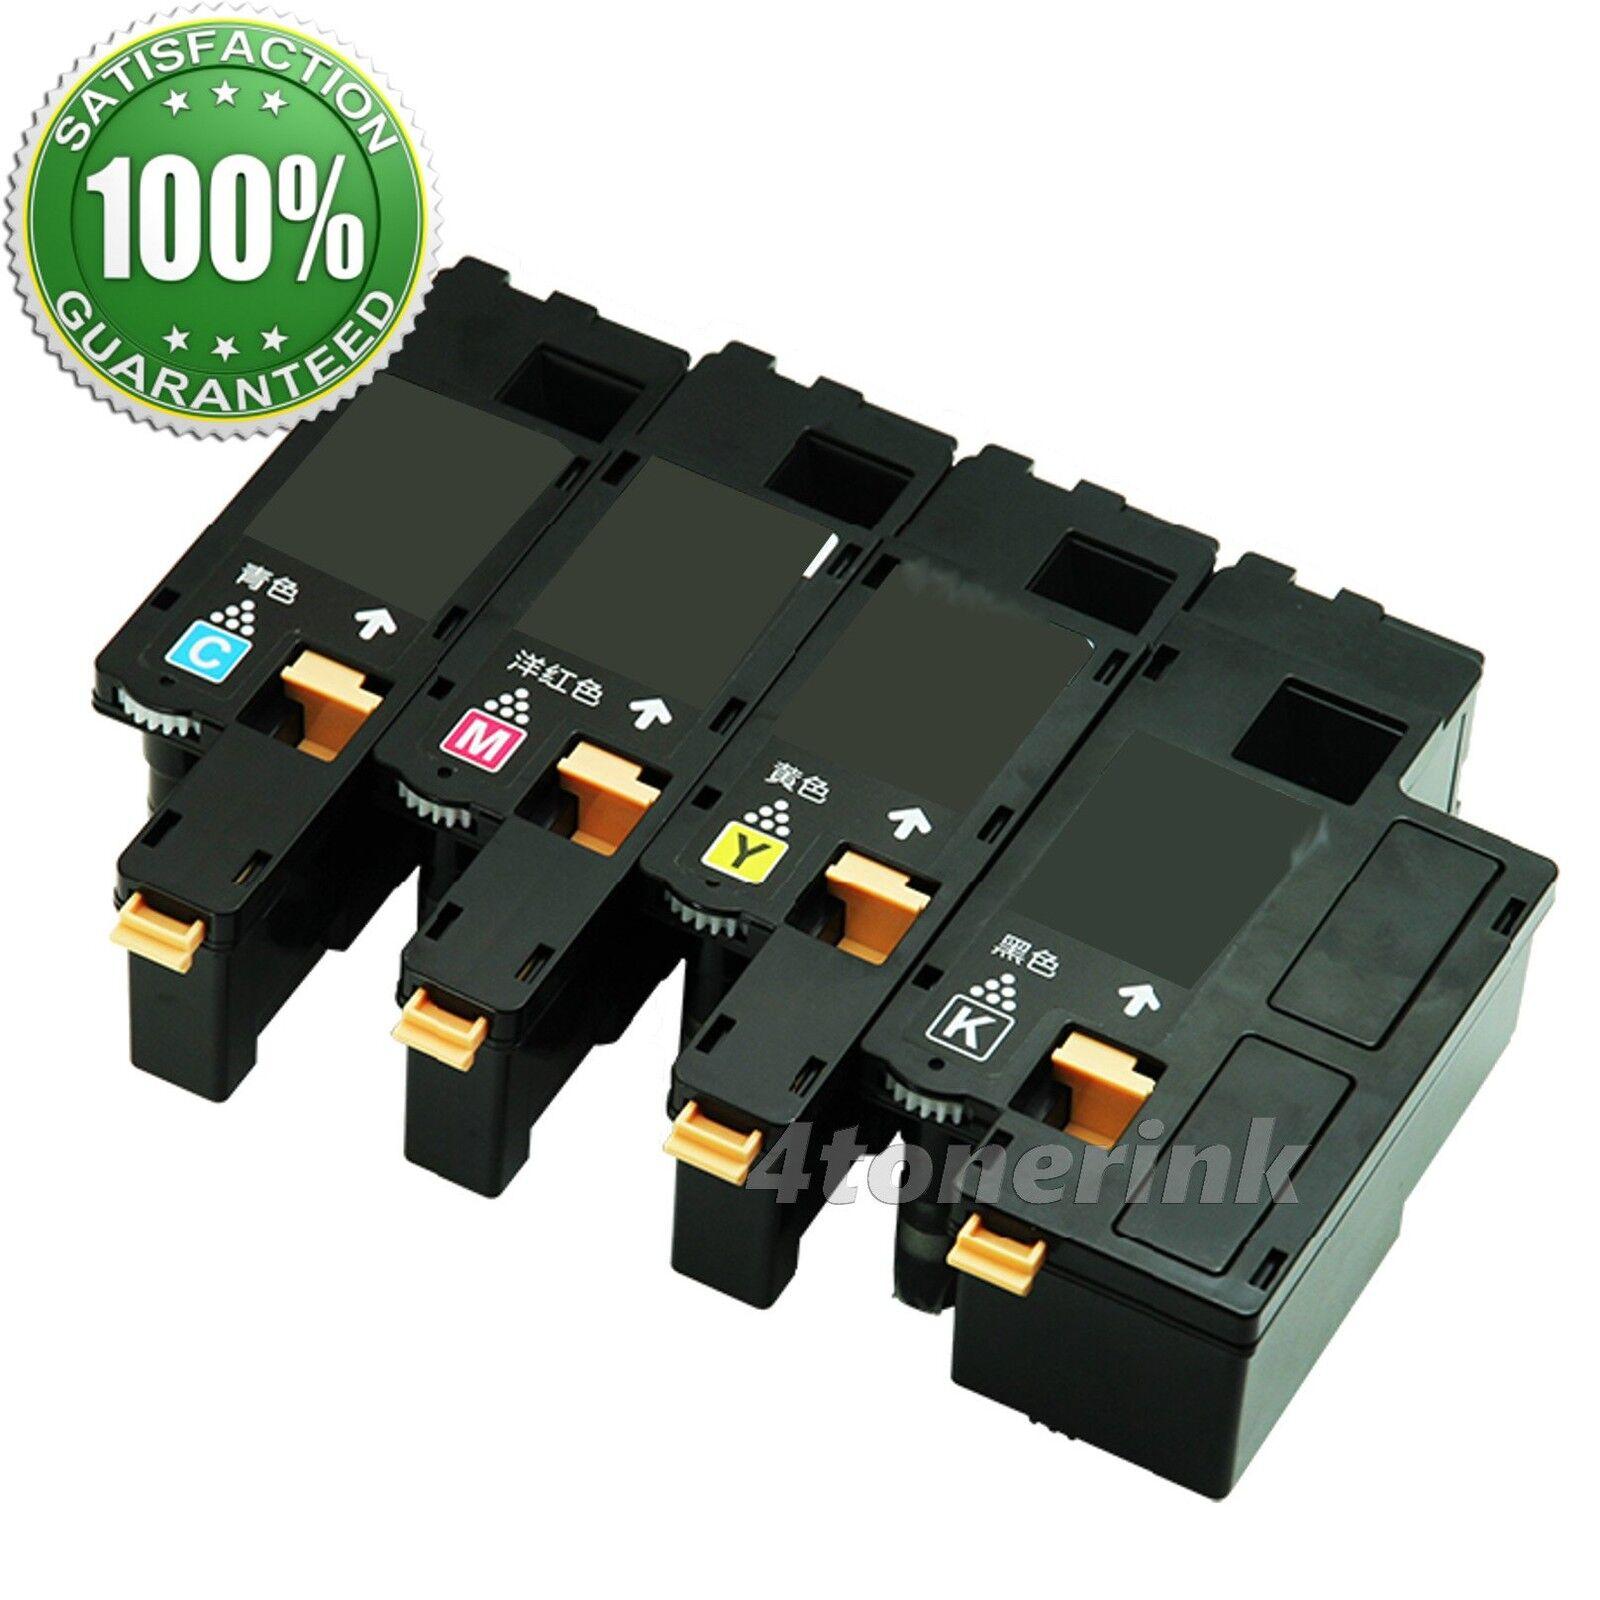 4pk Color Toner Cartridges For Dell E525W 593-BBJU 593-BBJV 593-BBJW 593-BBJX